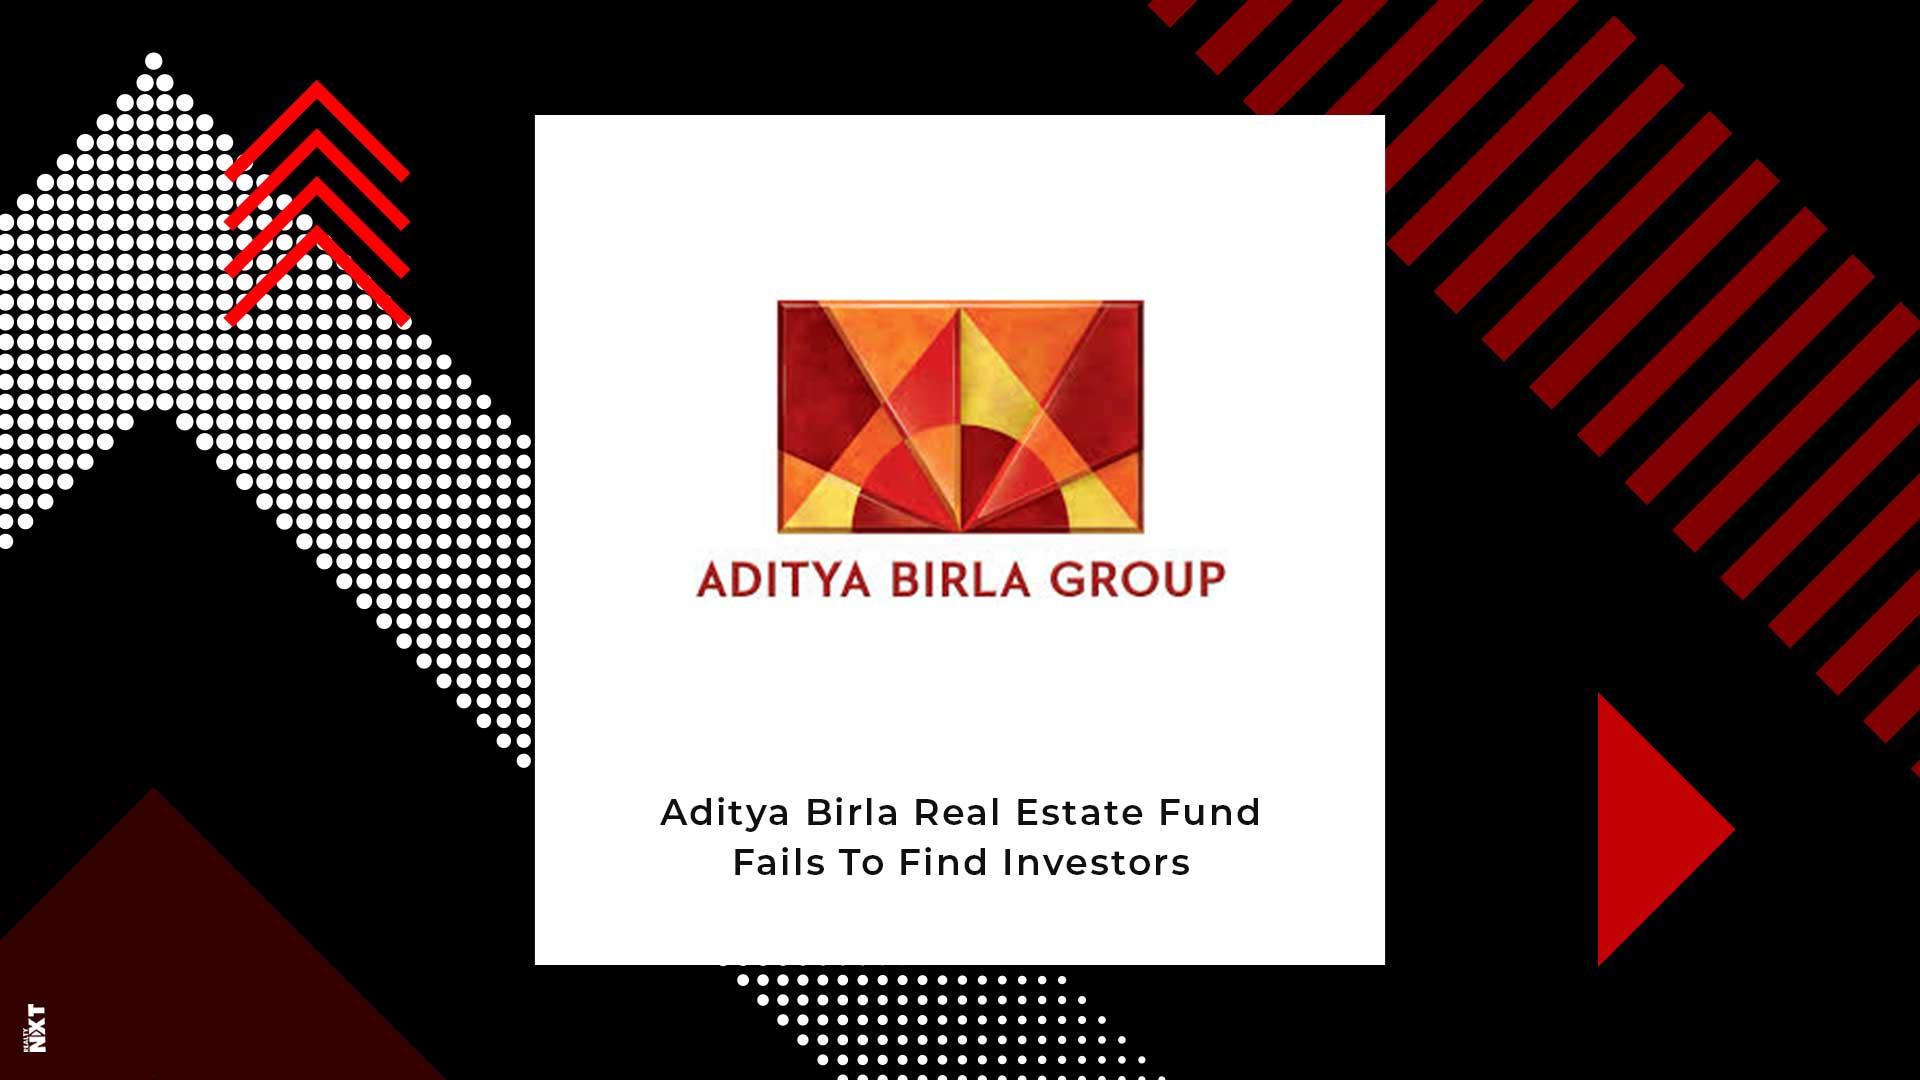 Aditya Birla Real Estate Fund Unable To Liquidate